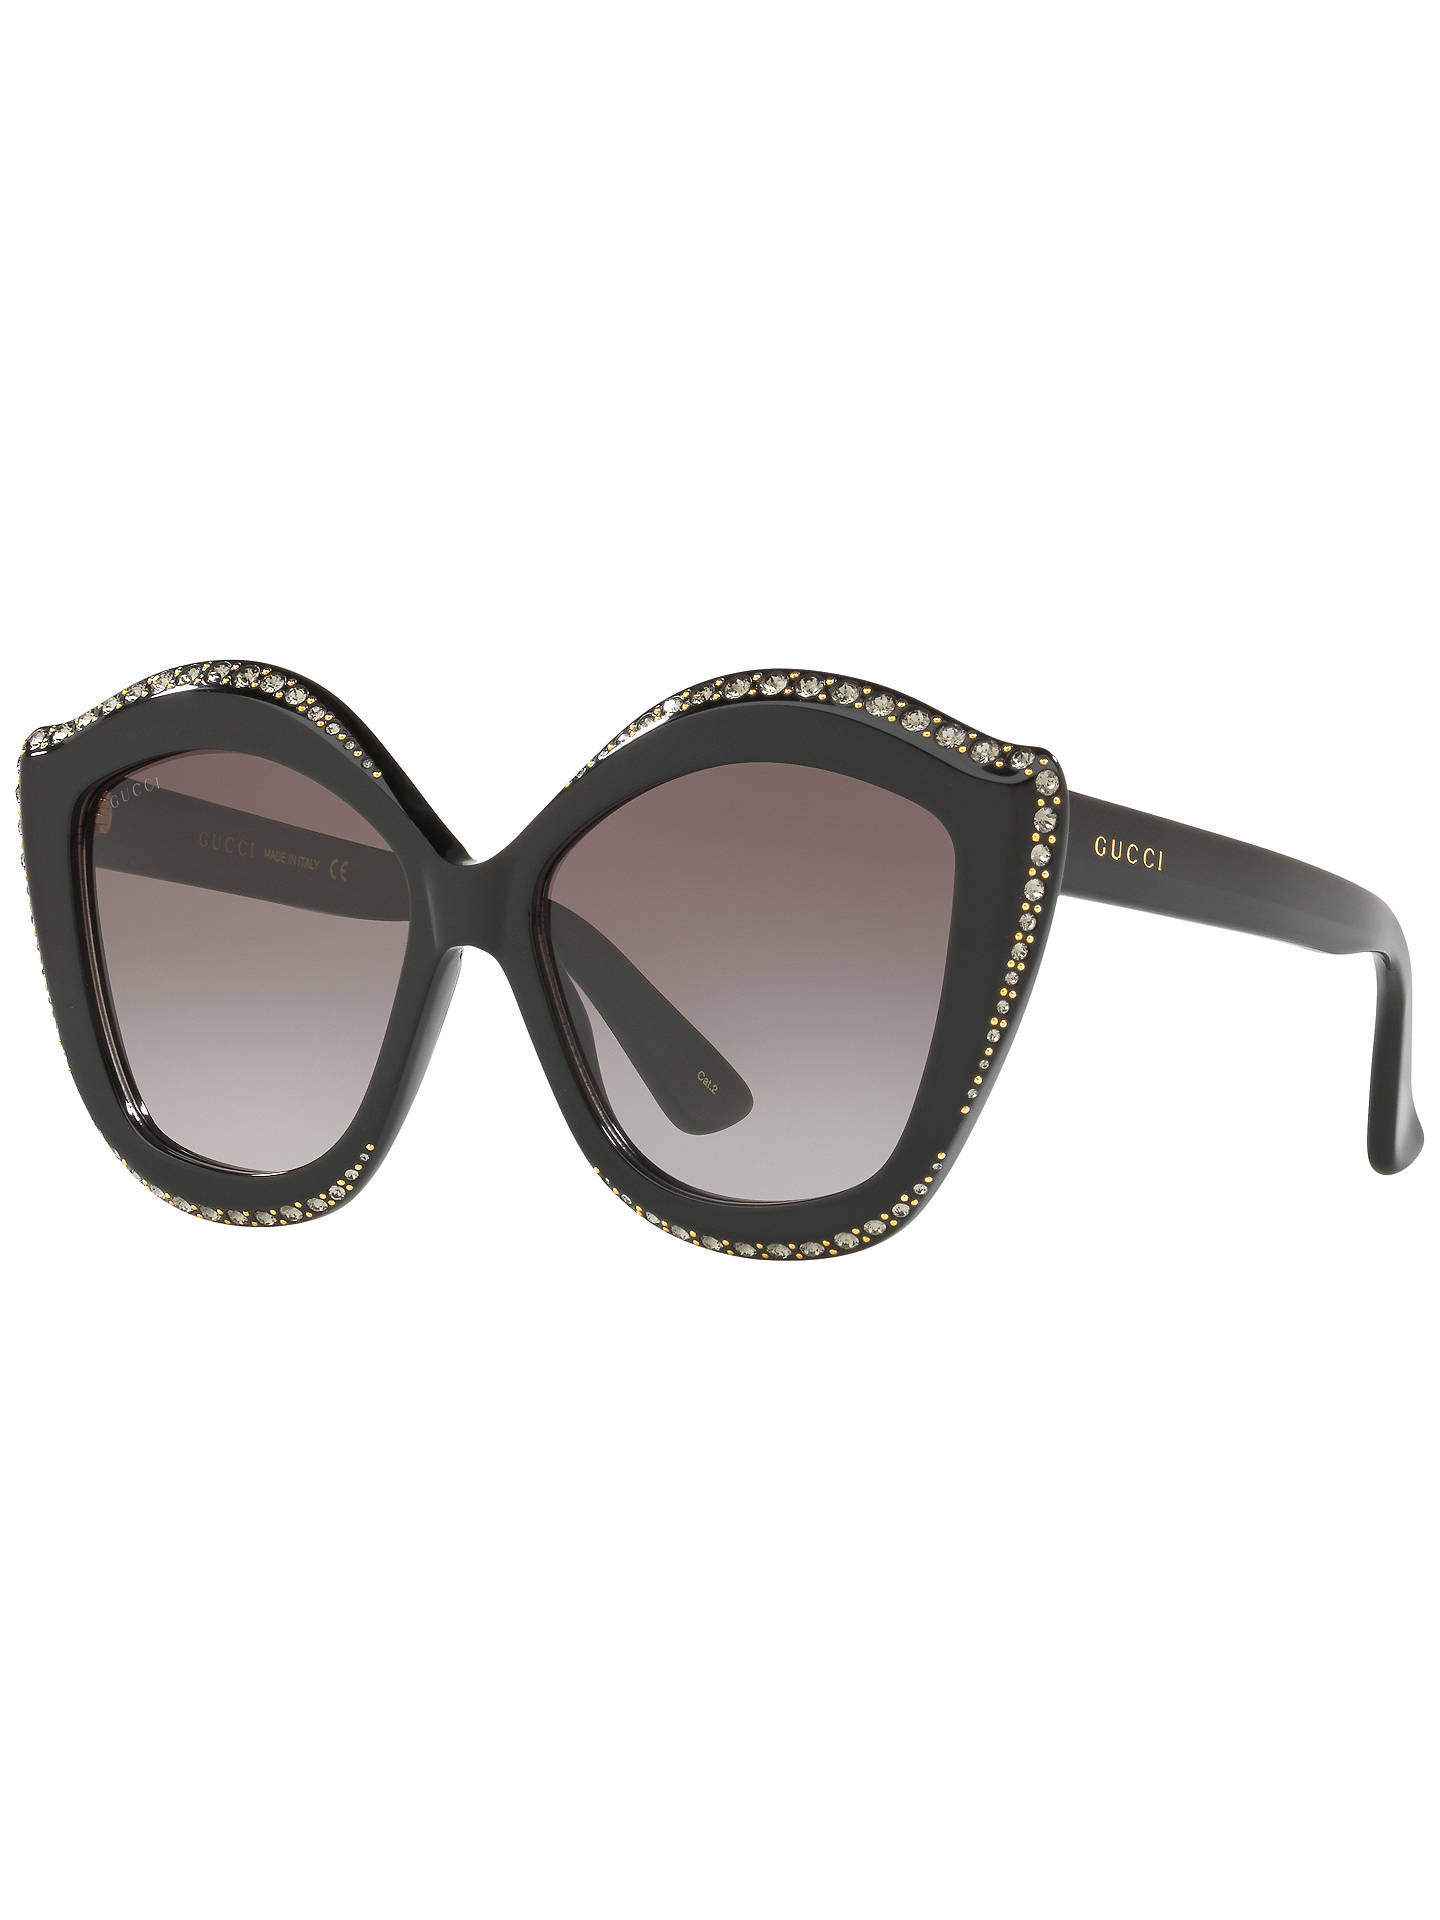 f31ffe8713 Gucci GG0118S Embellished Cat s Eye Sunglasses at John Lewis   Partners